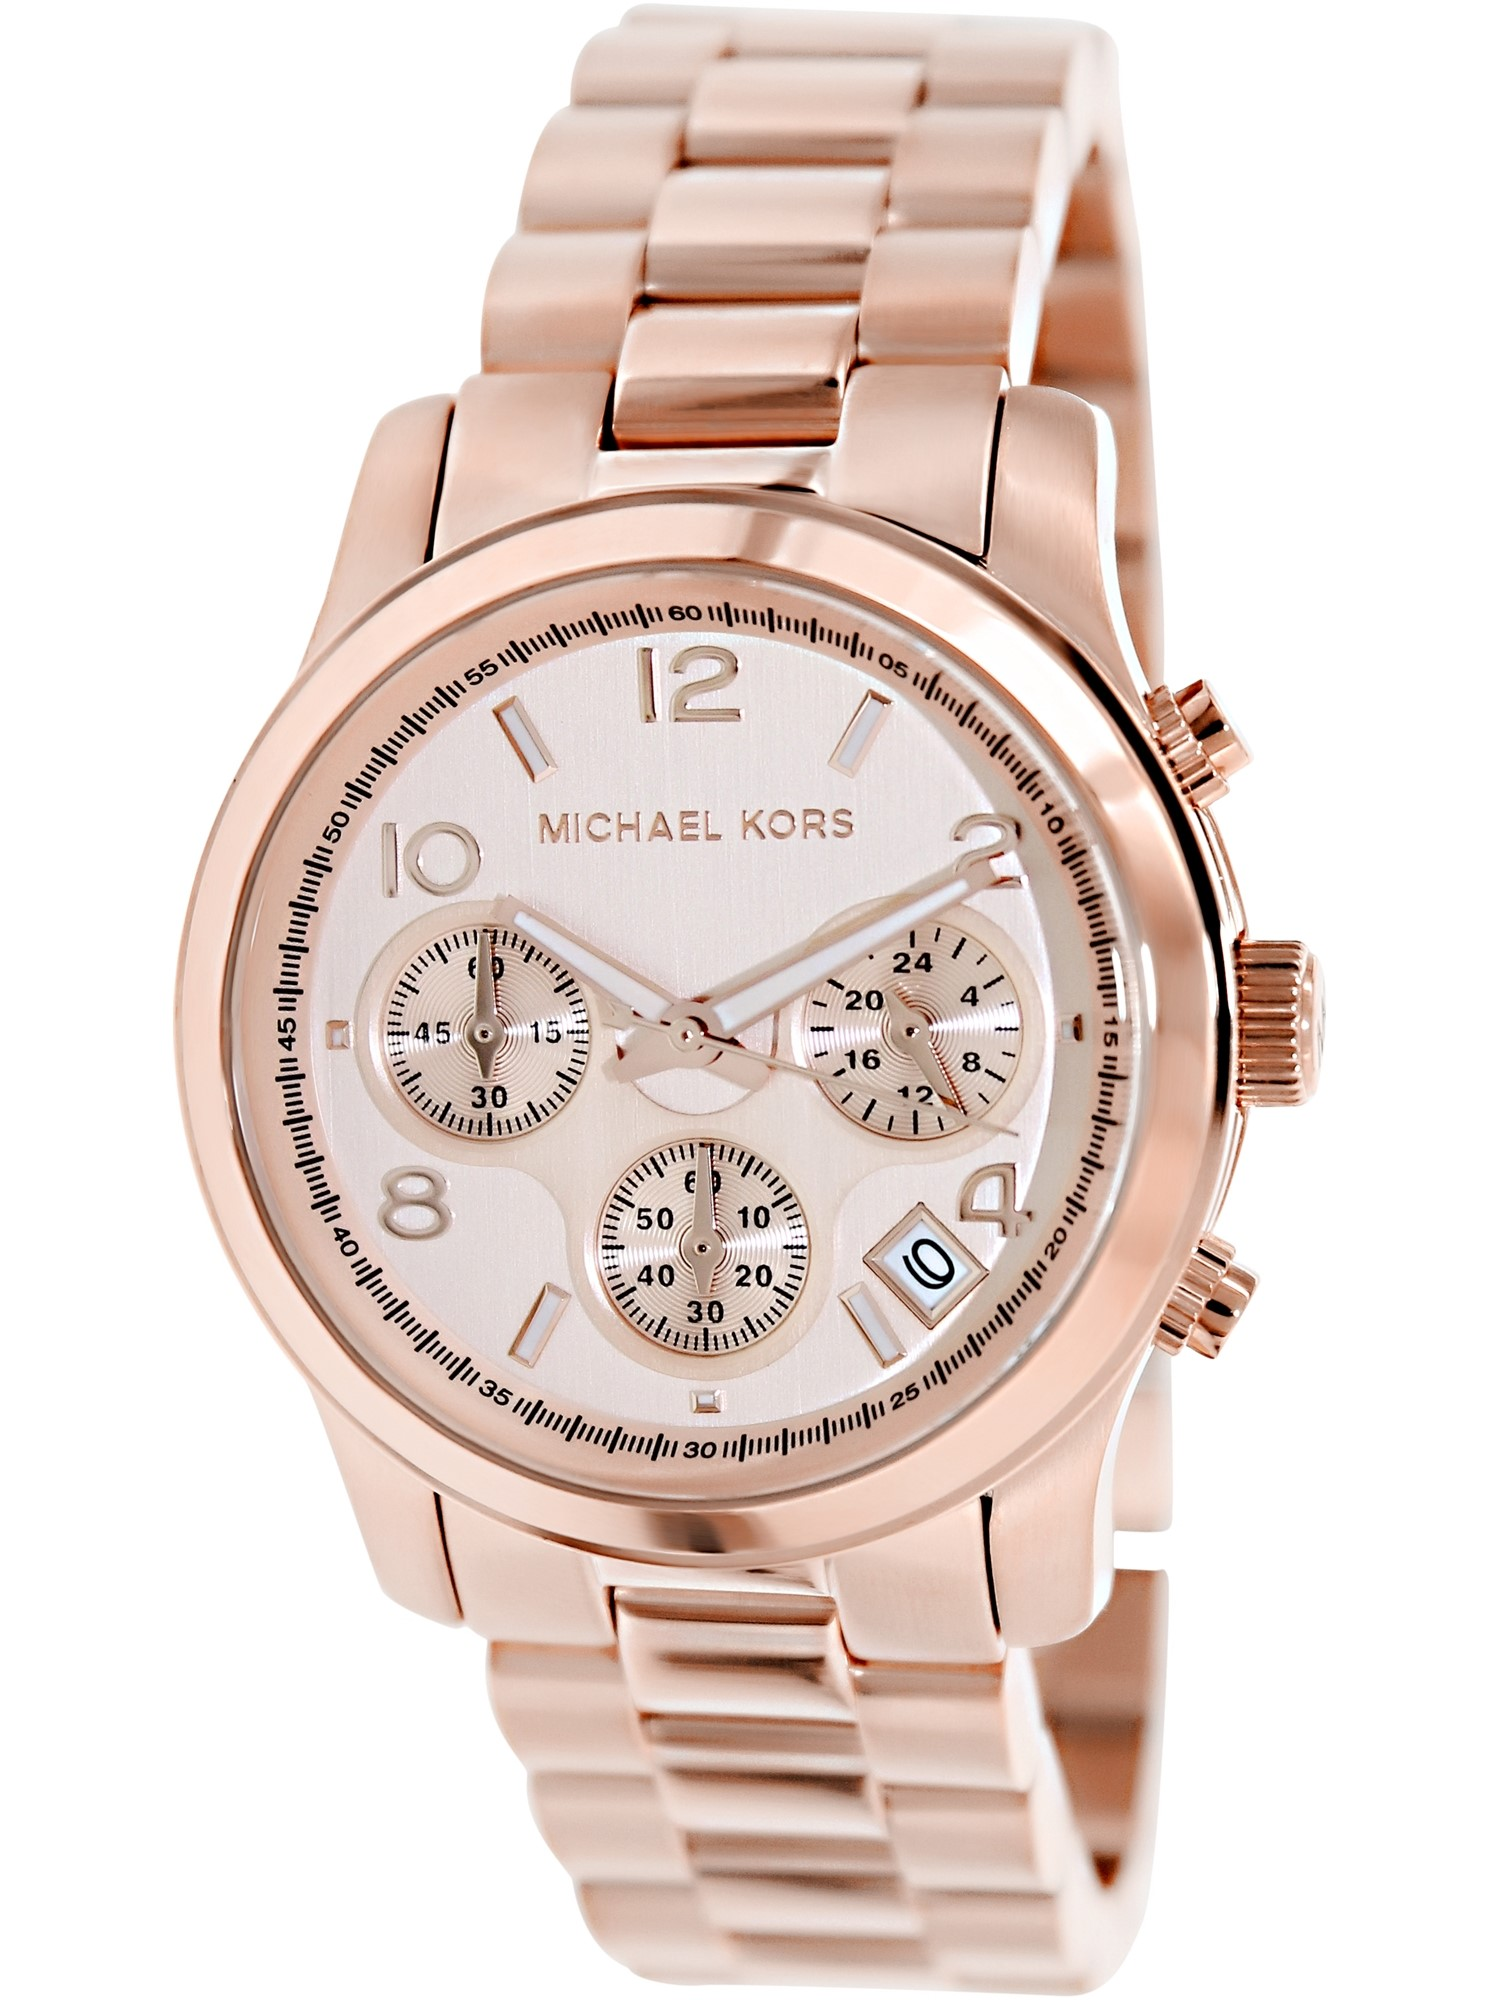 Rose Gold Stainless Steel Women's Watch, MK5128